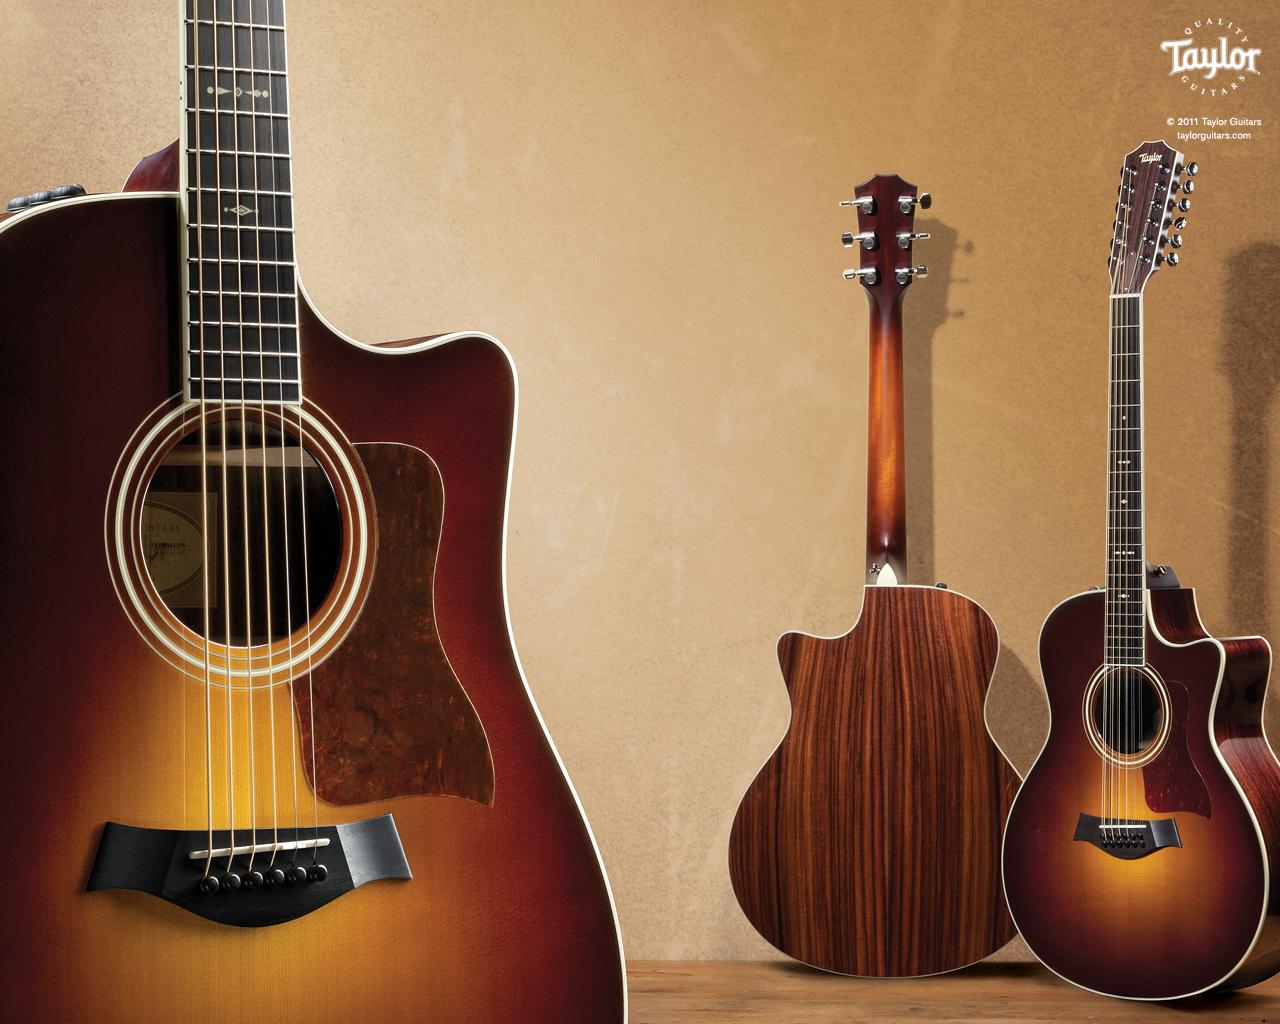 taylor guitars wallpapers - photo #10